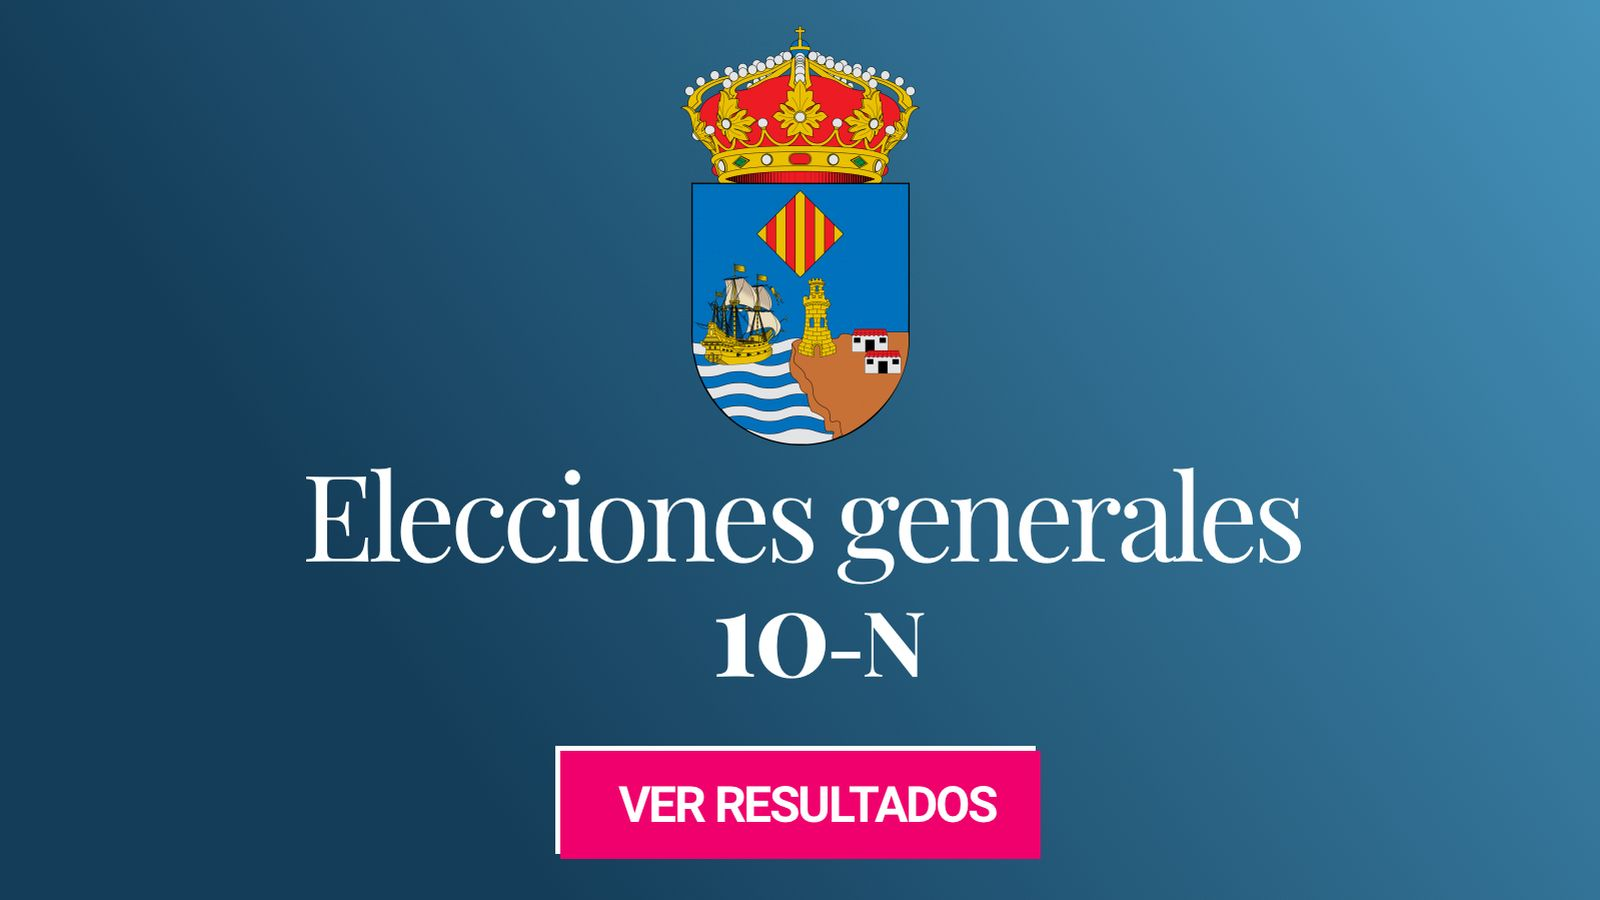 Foto: Elecciones generales 2019 en Torrevieja. (C.C./EC)